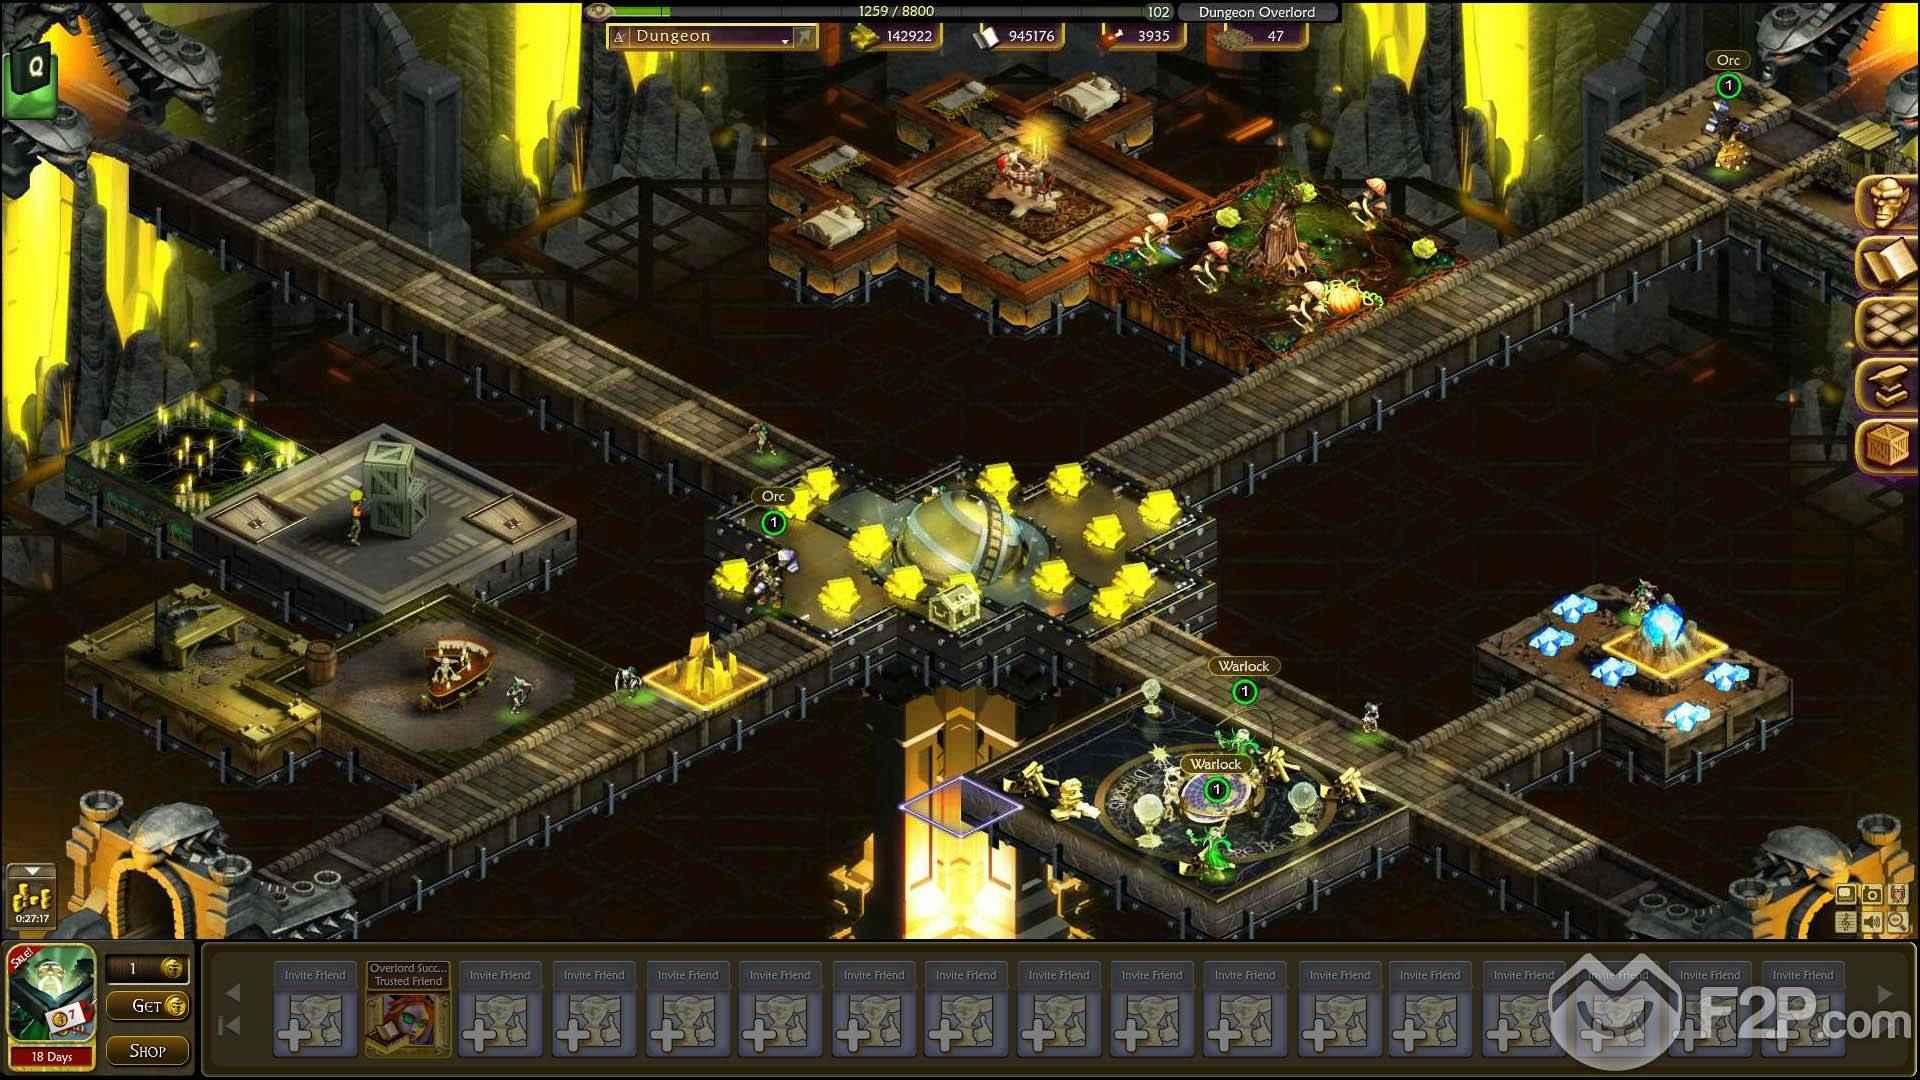 Gameforge Presents Goblin Keeper